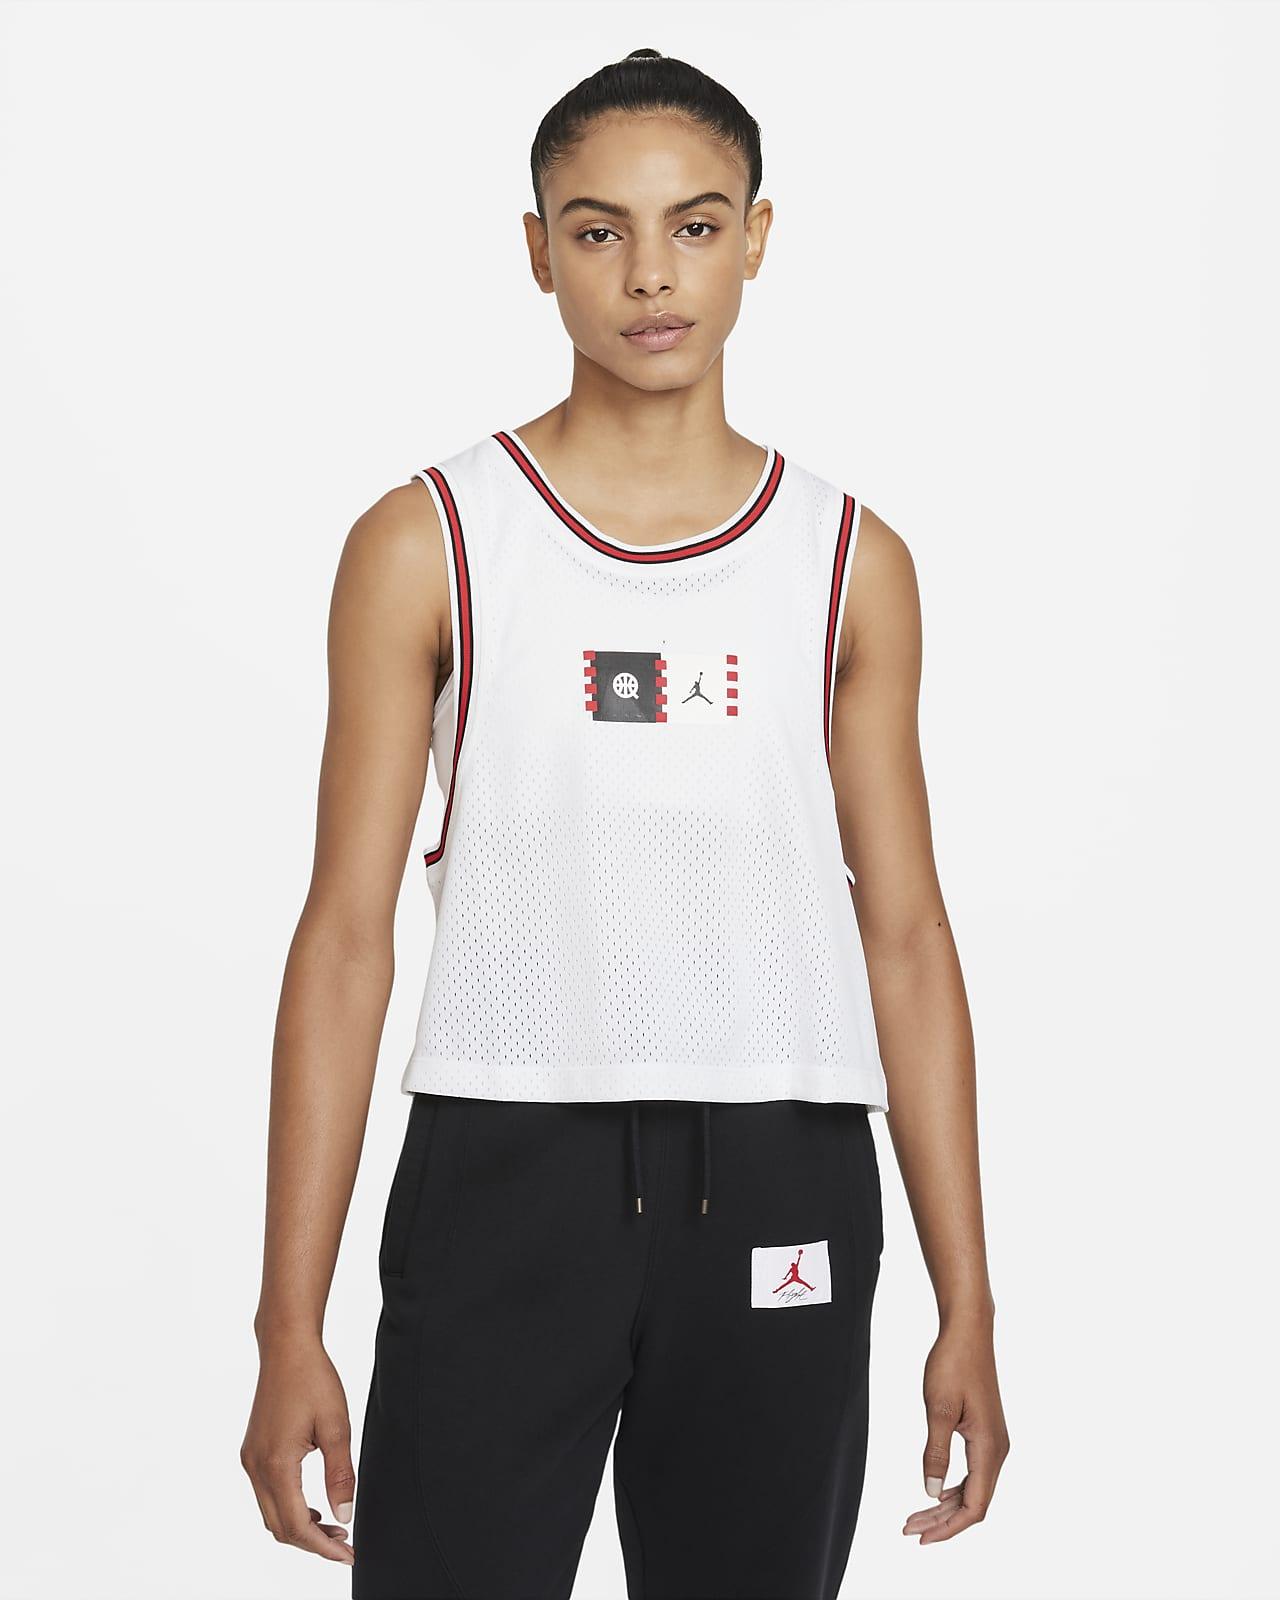 Jordan Quai 54 Women's Essential Jersey